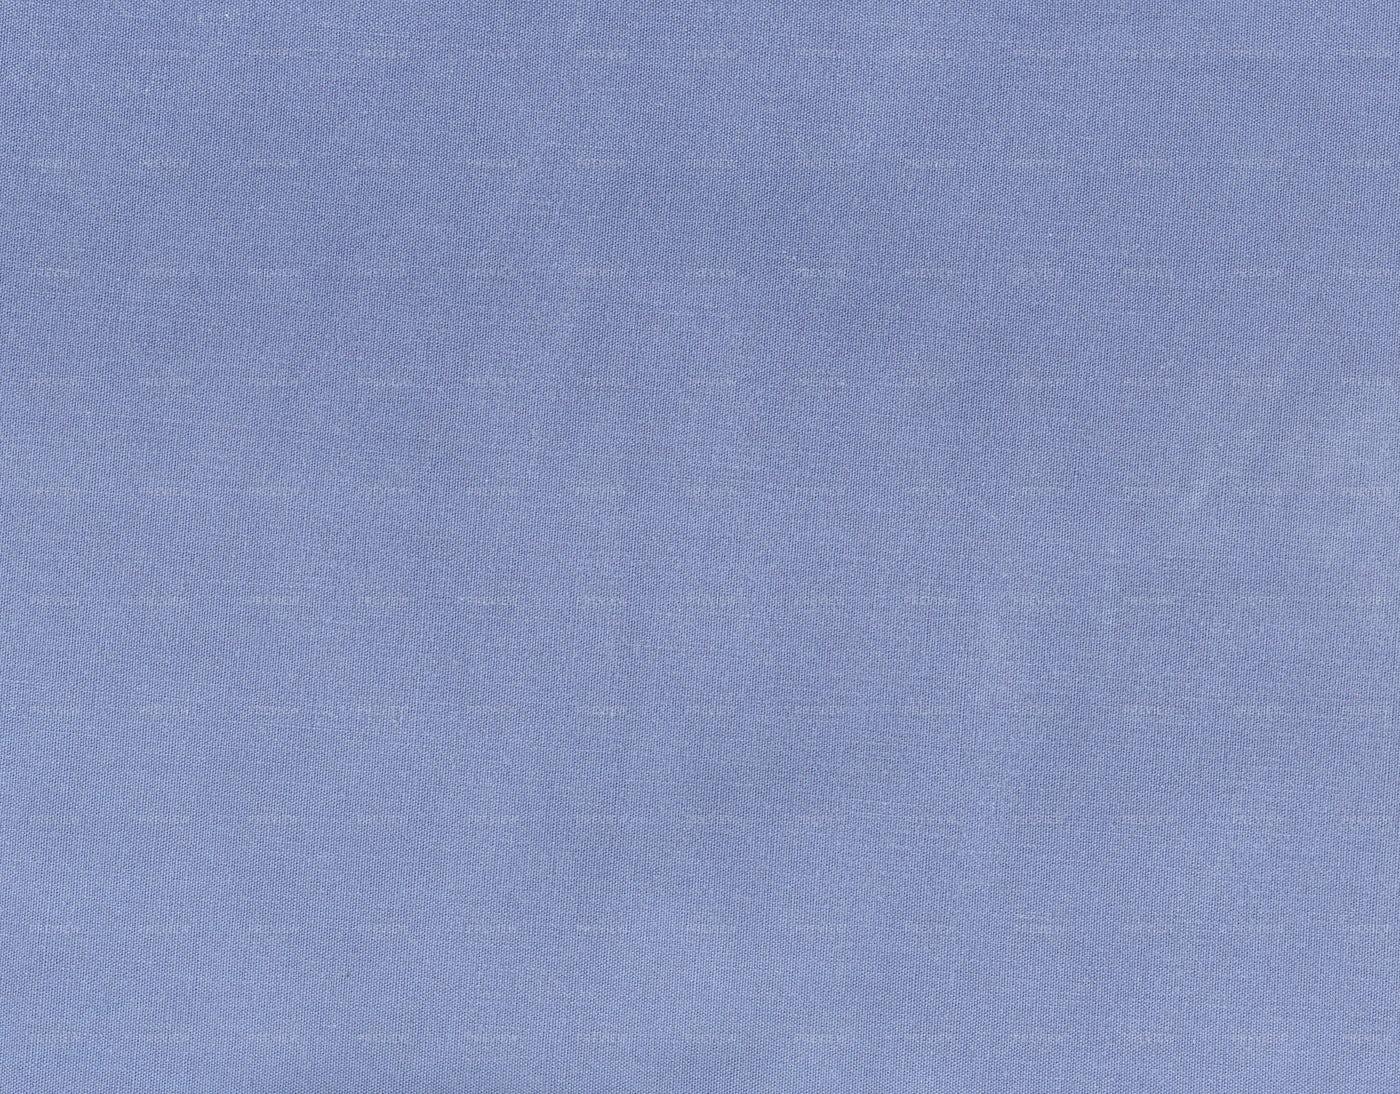 Light Blue Fabric: Stock Photos